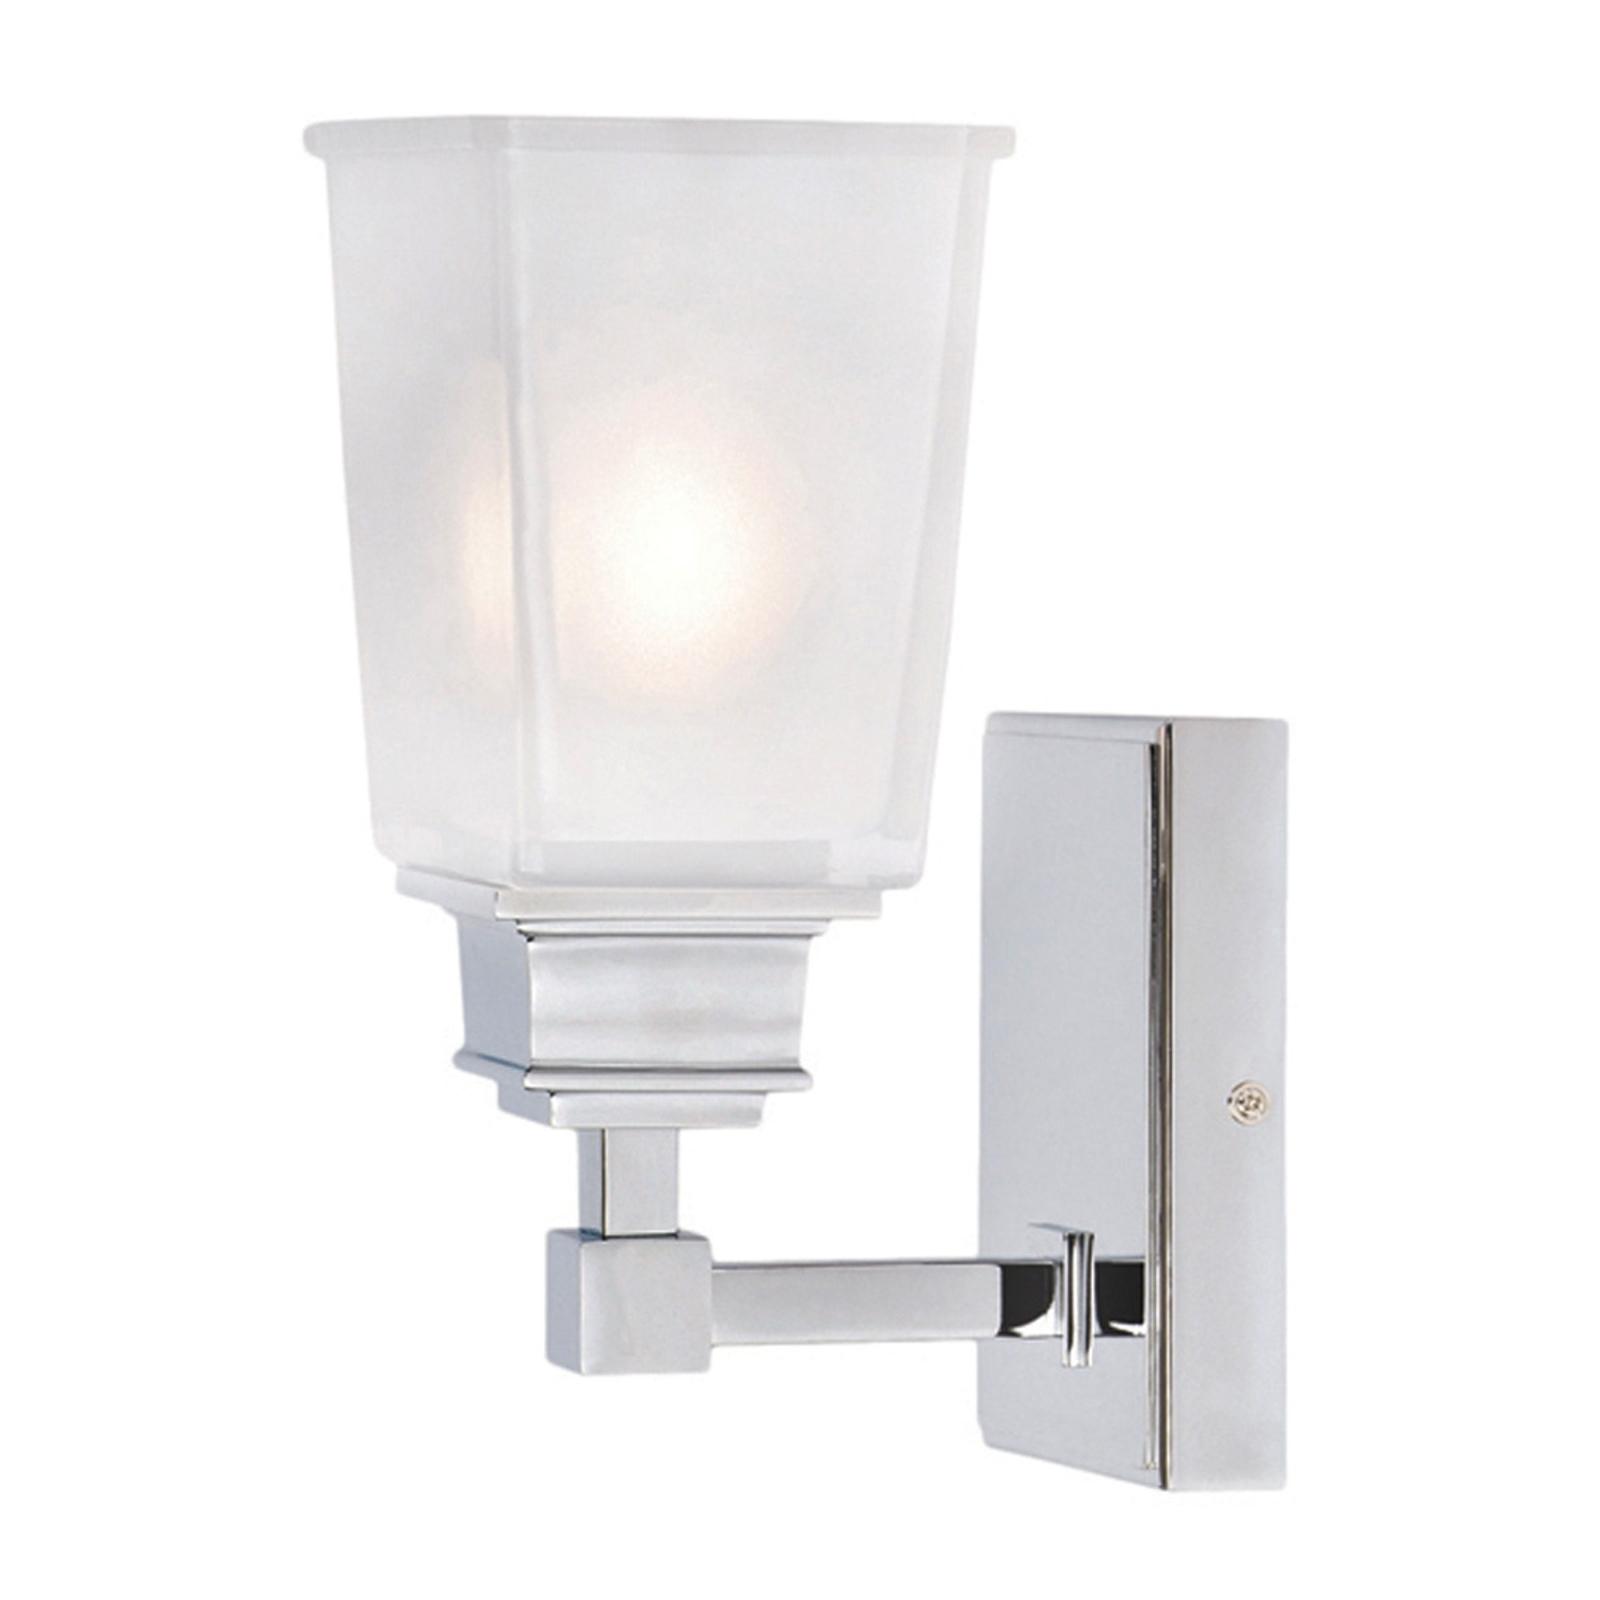 Tøff Aylesbury speillampe